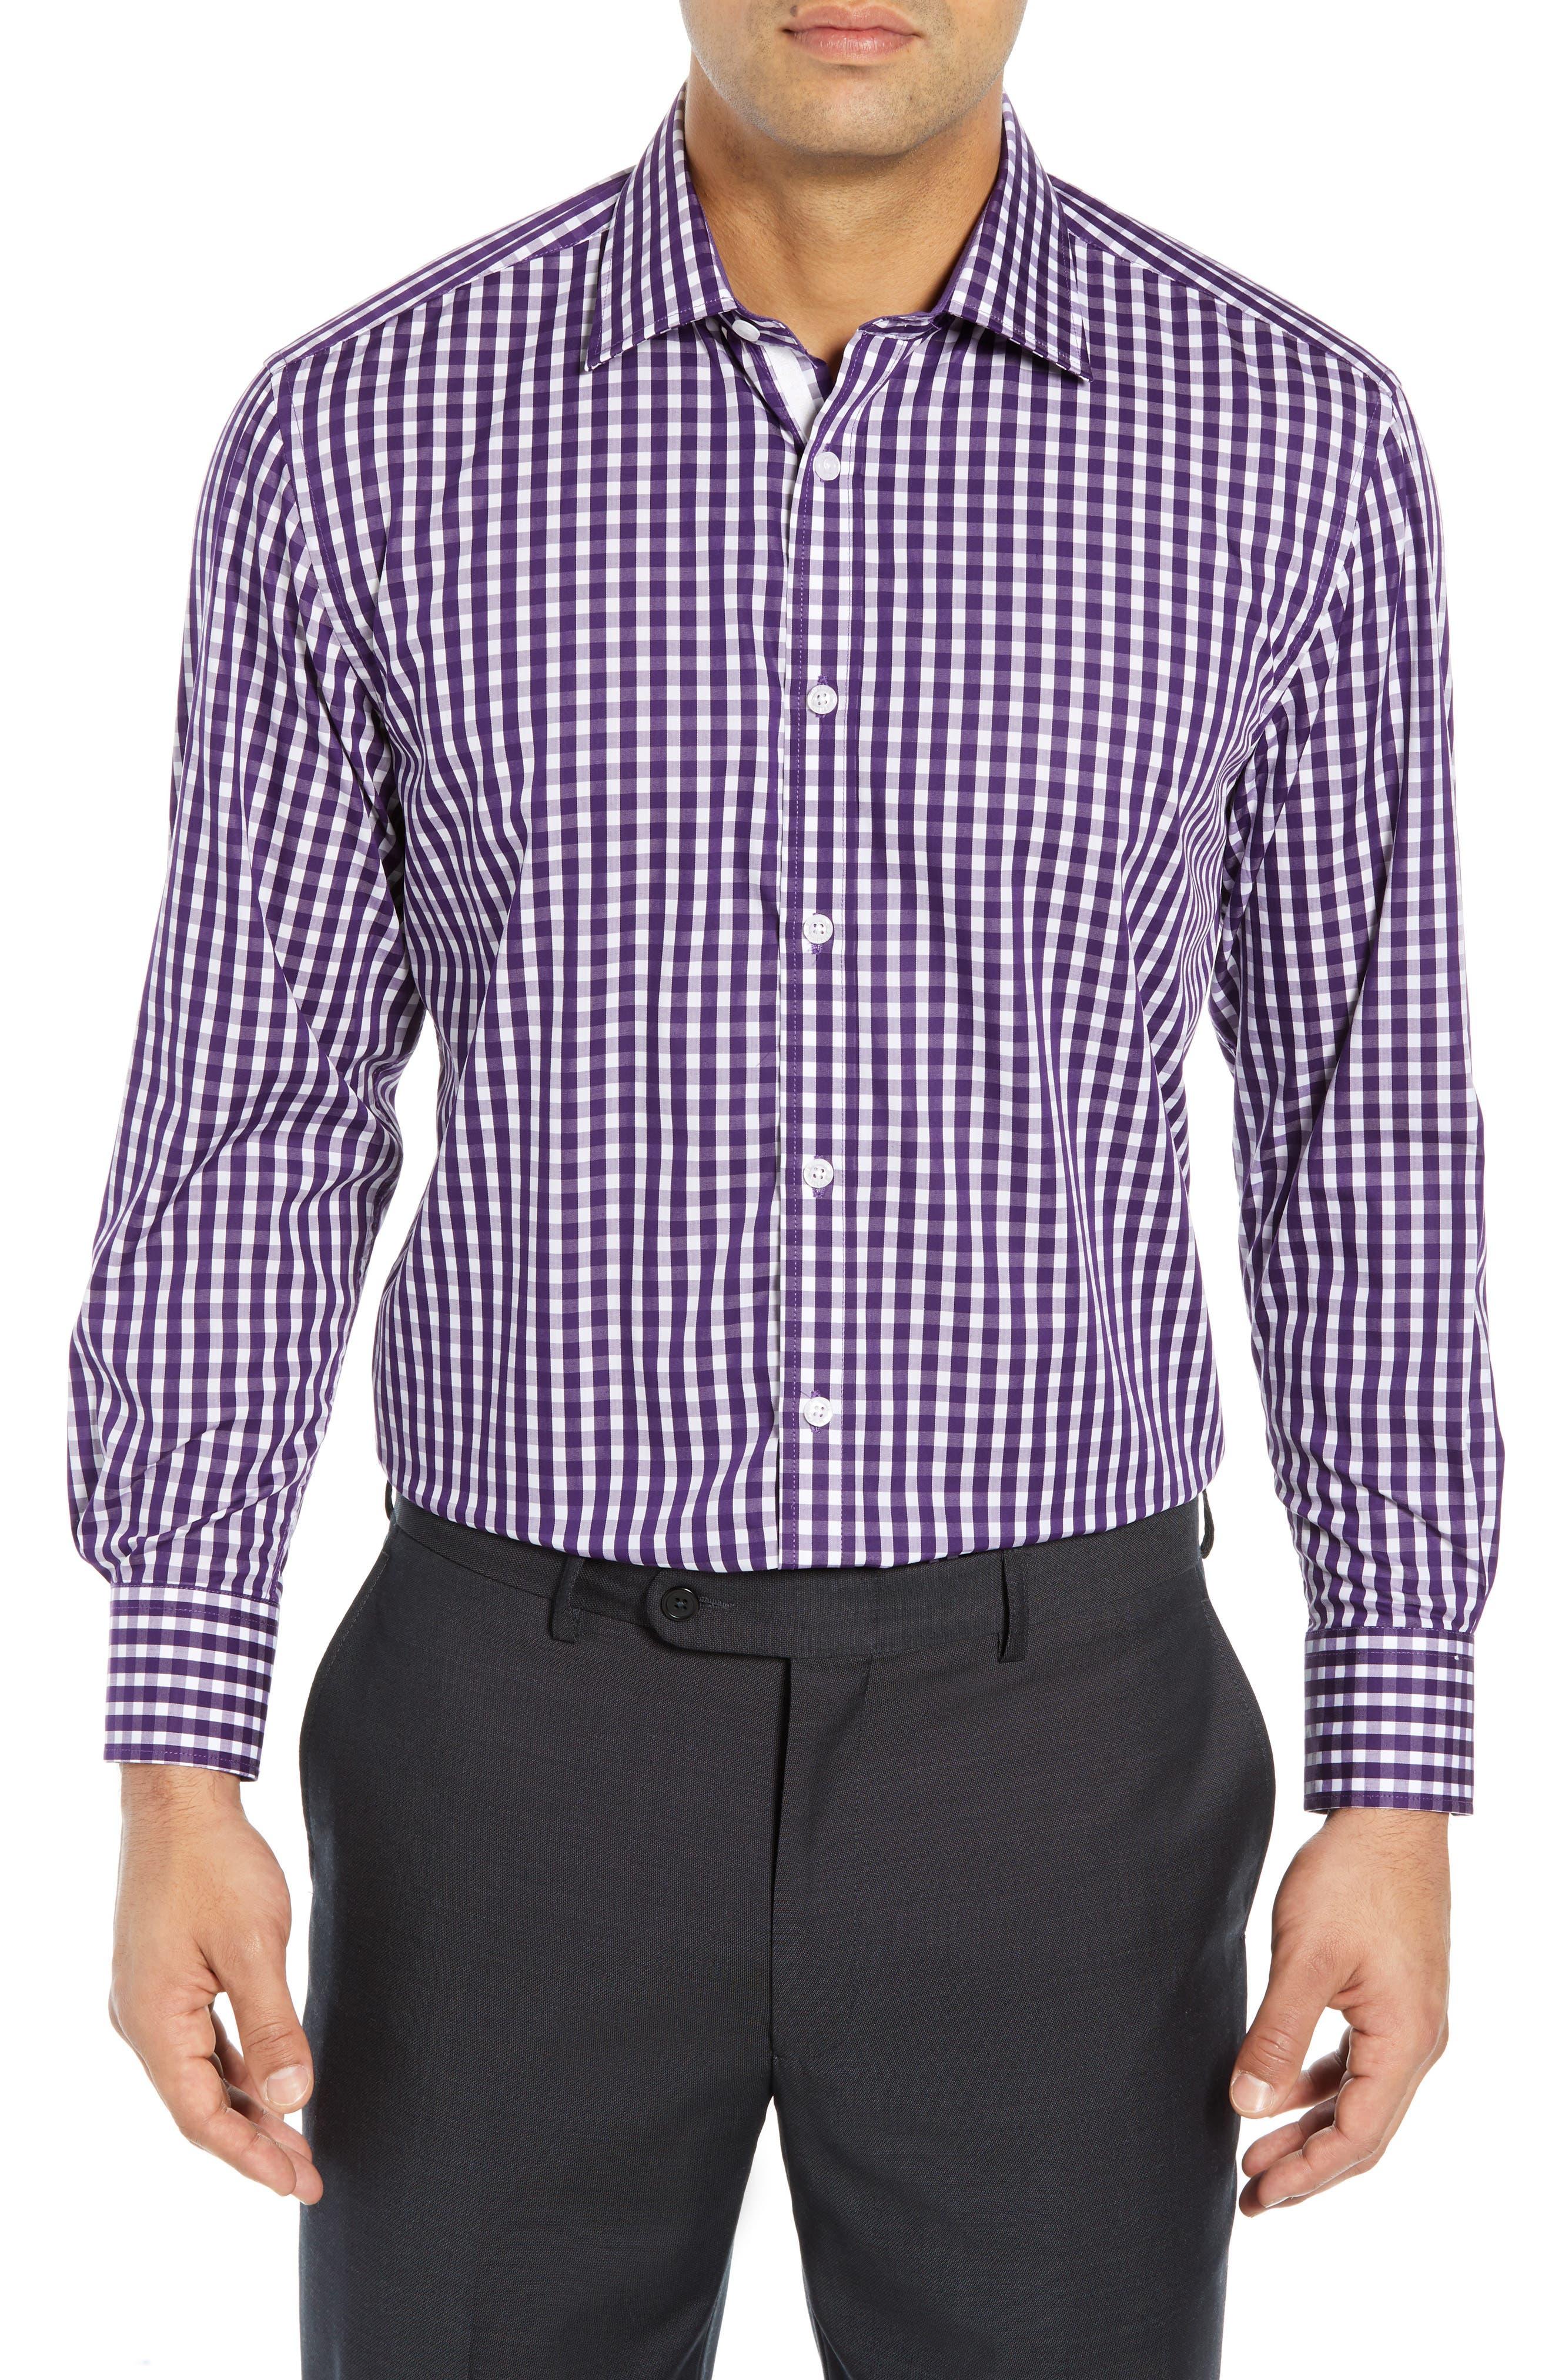 ENGLISH LAUNDRY Regular Fit Check Dress Shirt in Purple